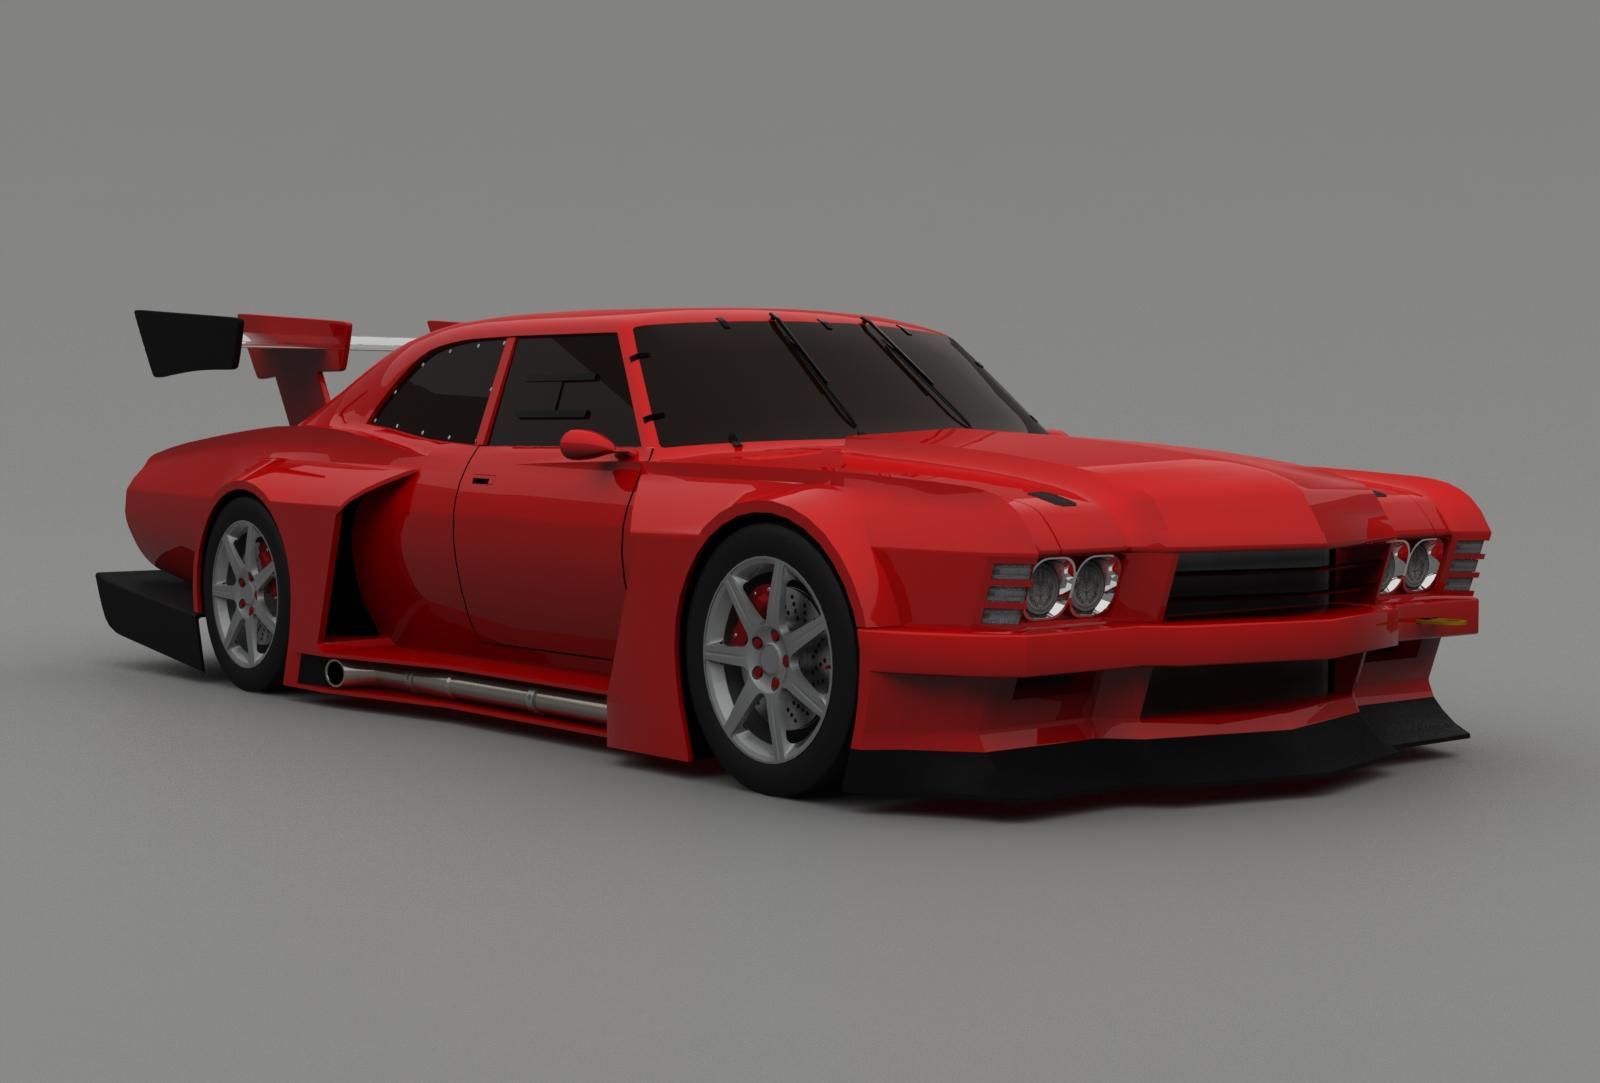 2013-03_The Crew_F.Beudin_Chevrolet Impala-1967-Racing2 Design_08